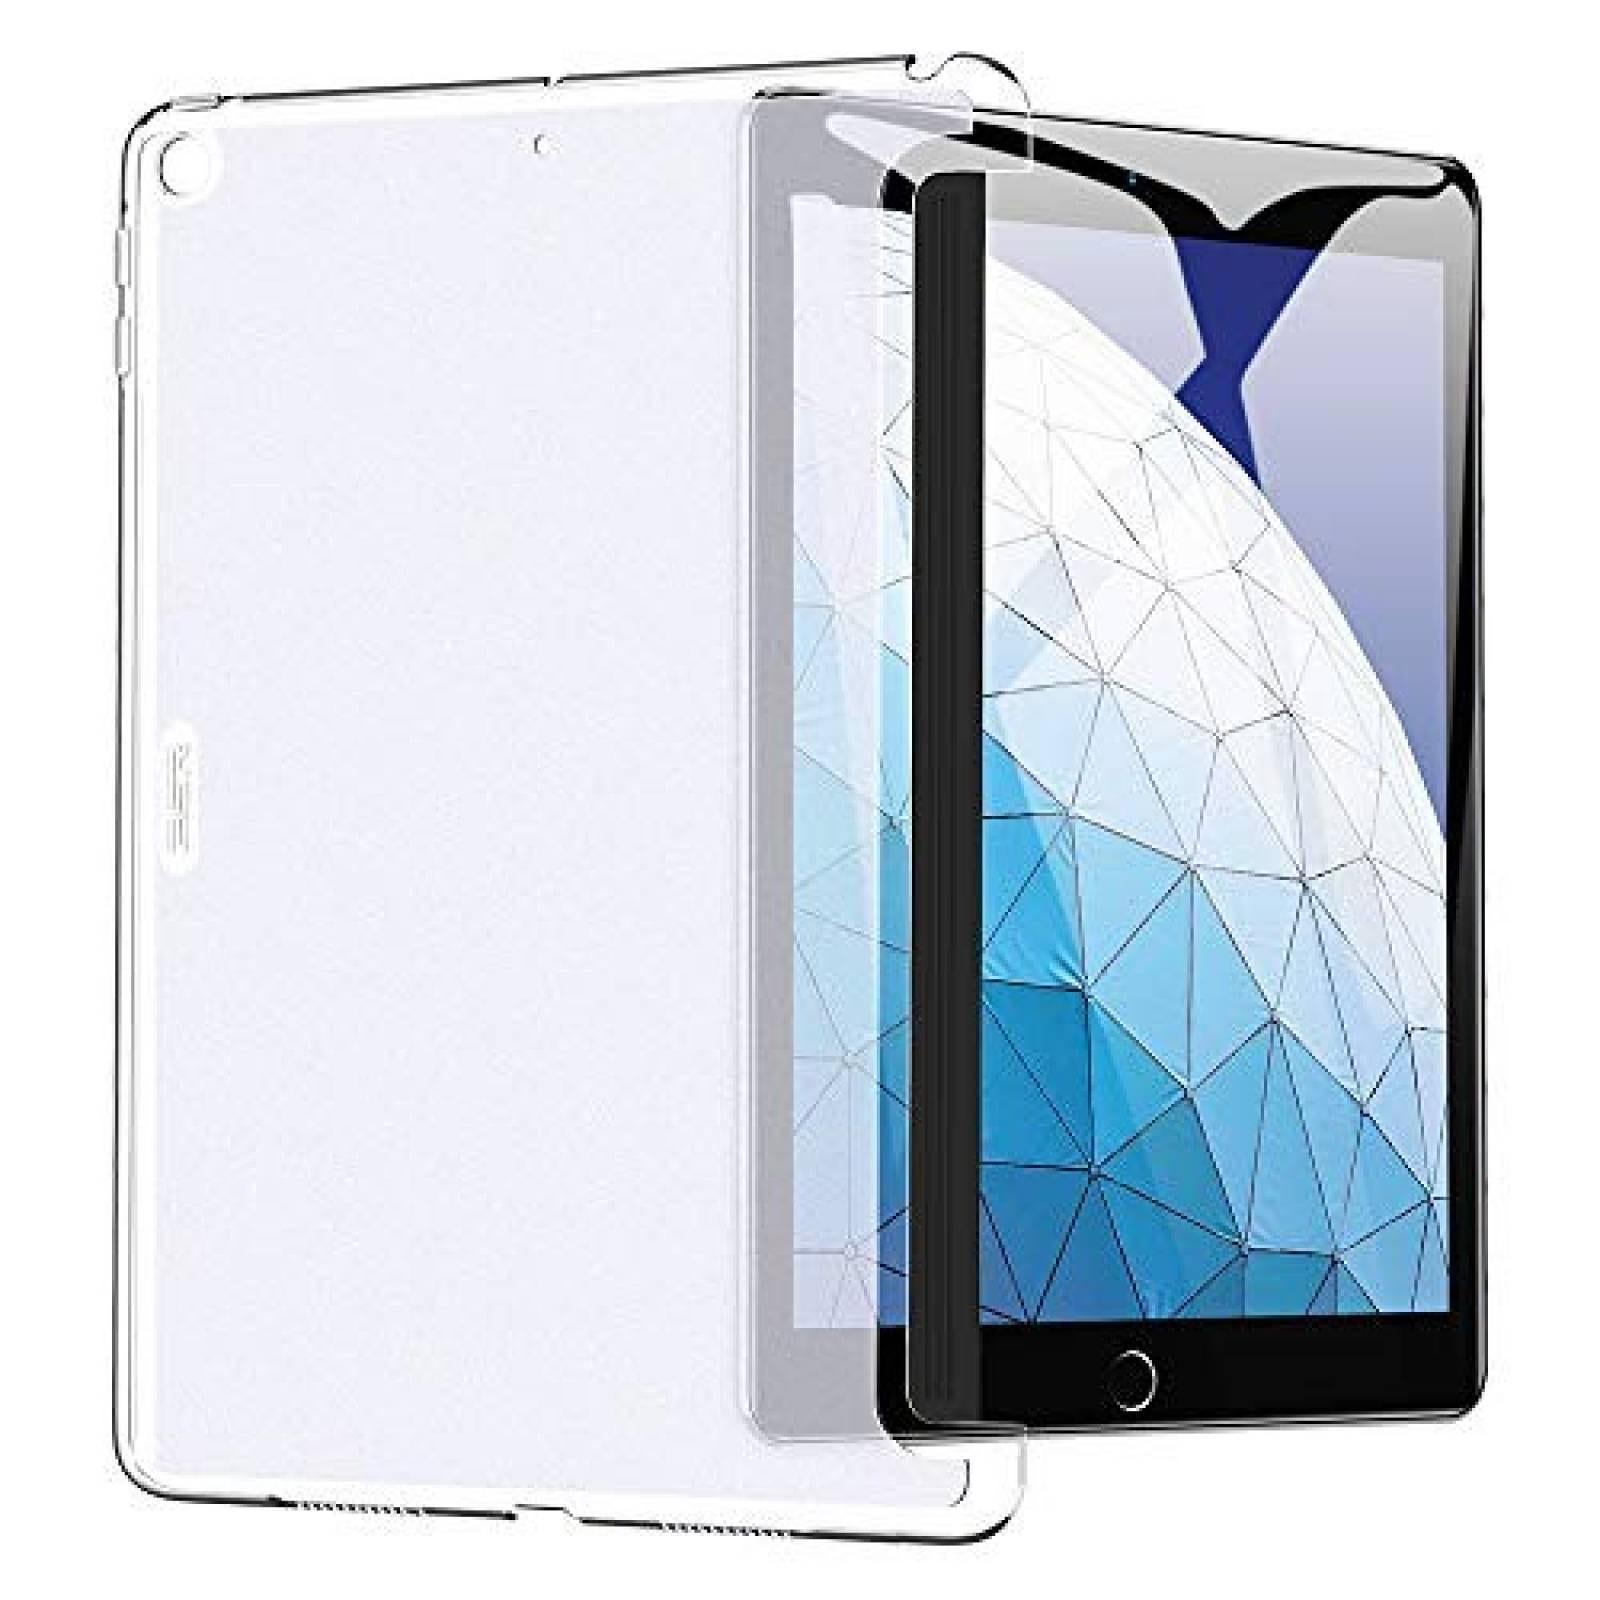 Funda ESR Yipee iPad Air 3 10.5'' 2019 -Transparente